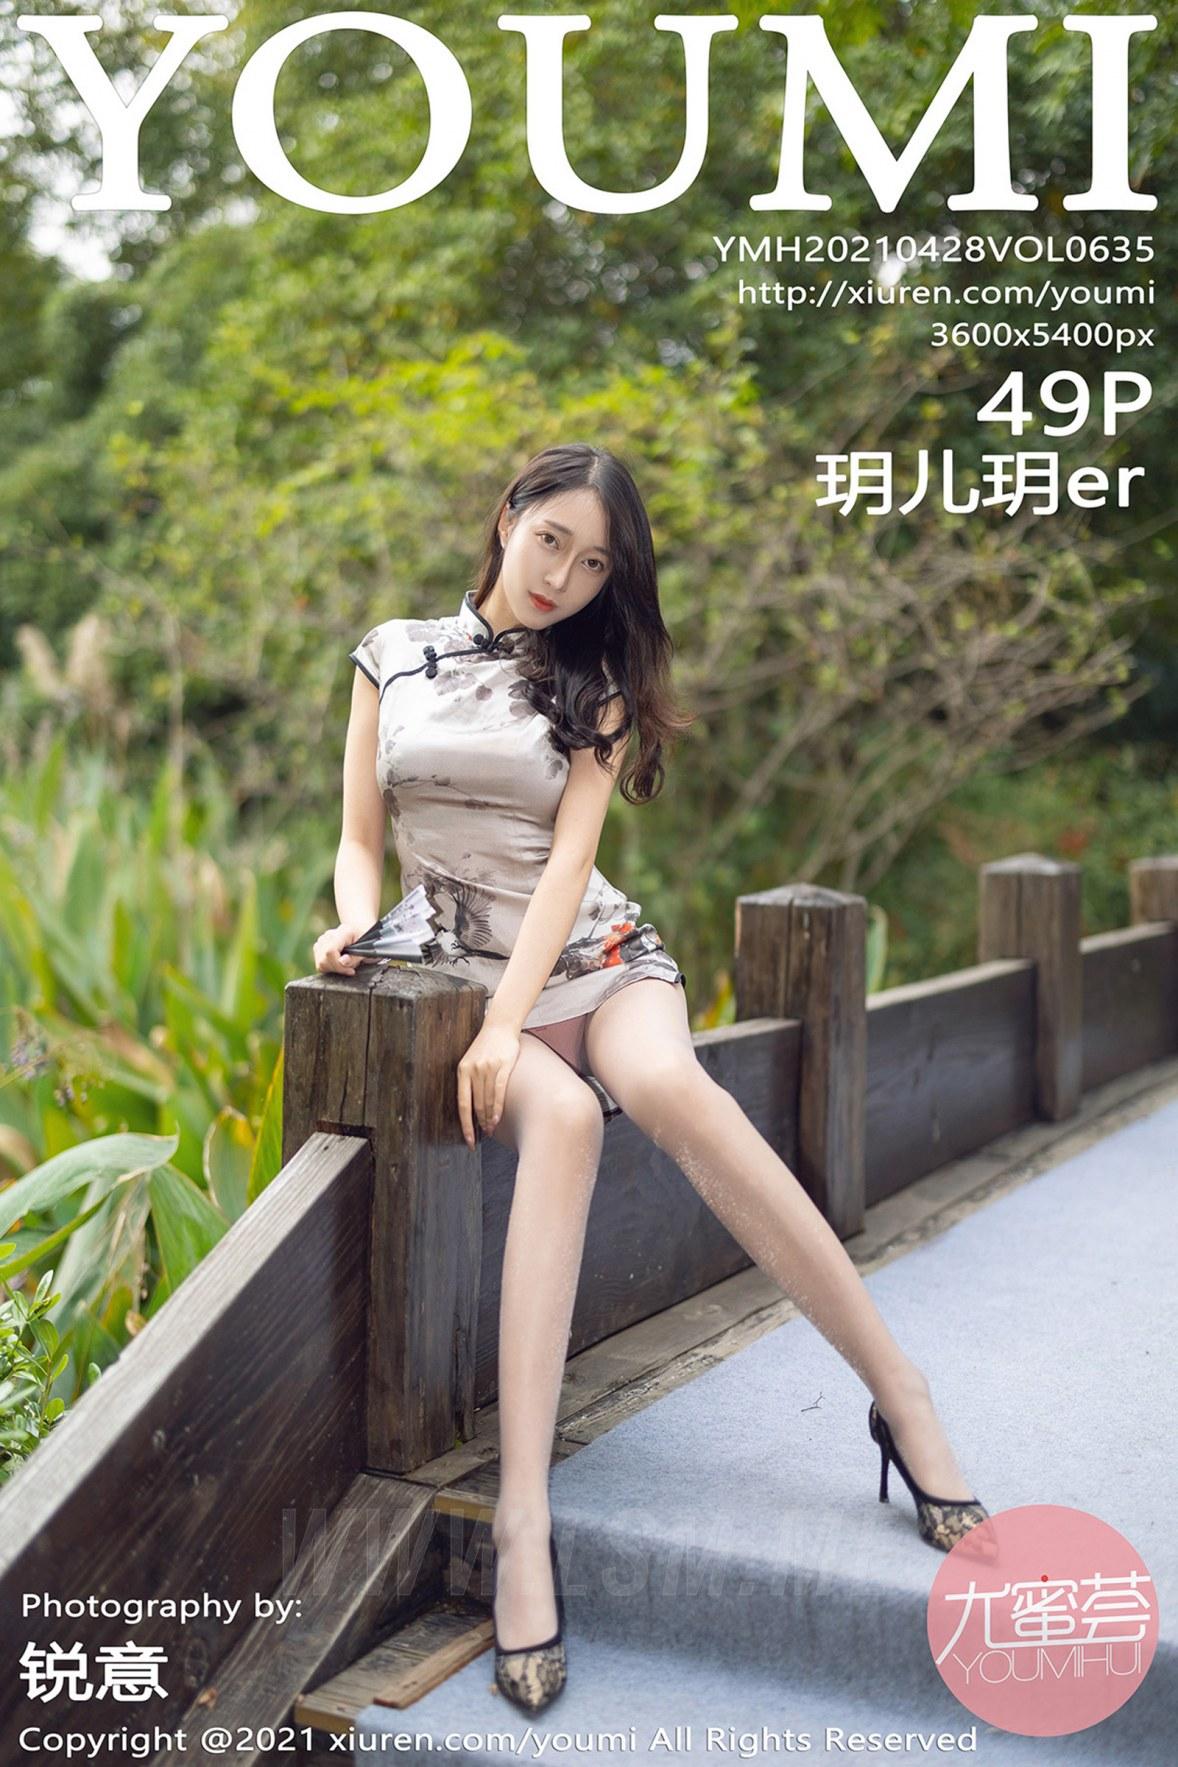 635 050 514 1200 1800 - YOUMI 尤蜜荟 Vol.635  浪漫旗袍 玥儿玥er - 尤蜜荟 -【免费在线写真】【丽人丝语】